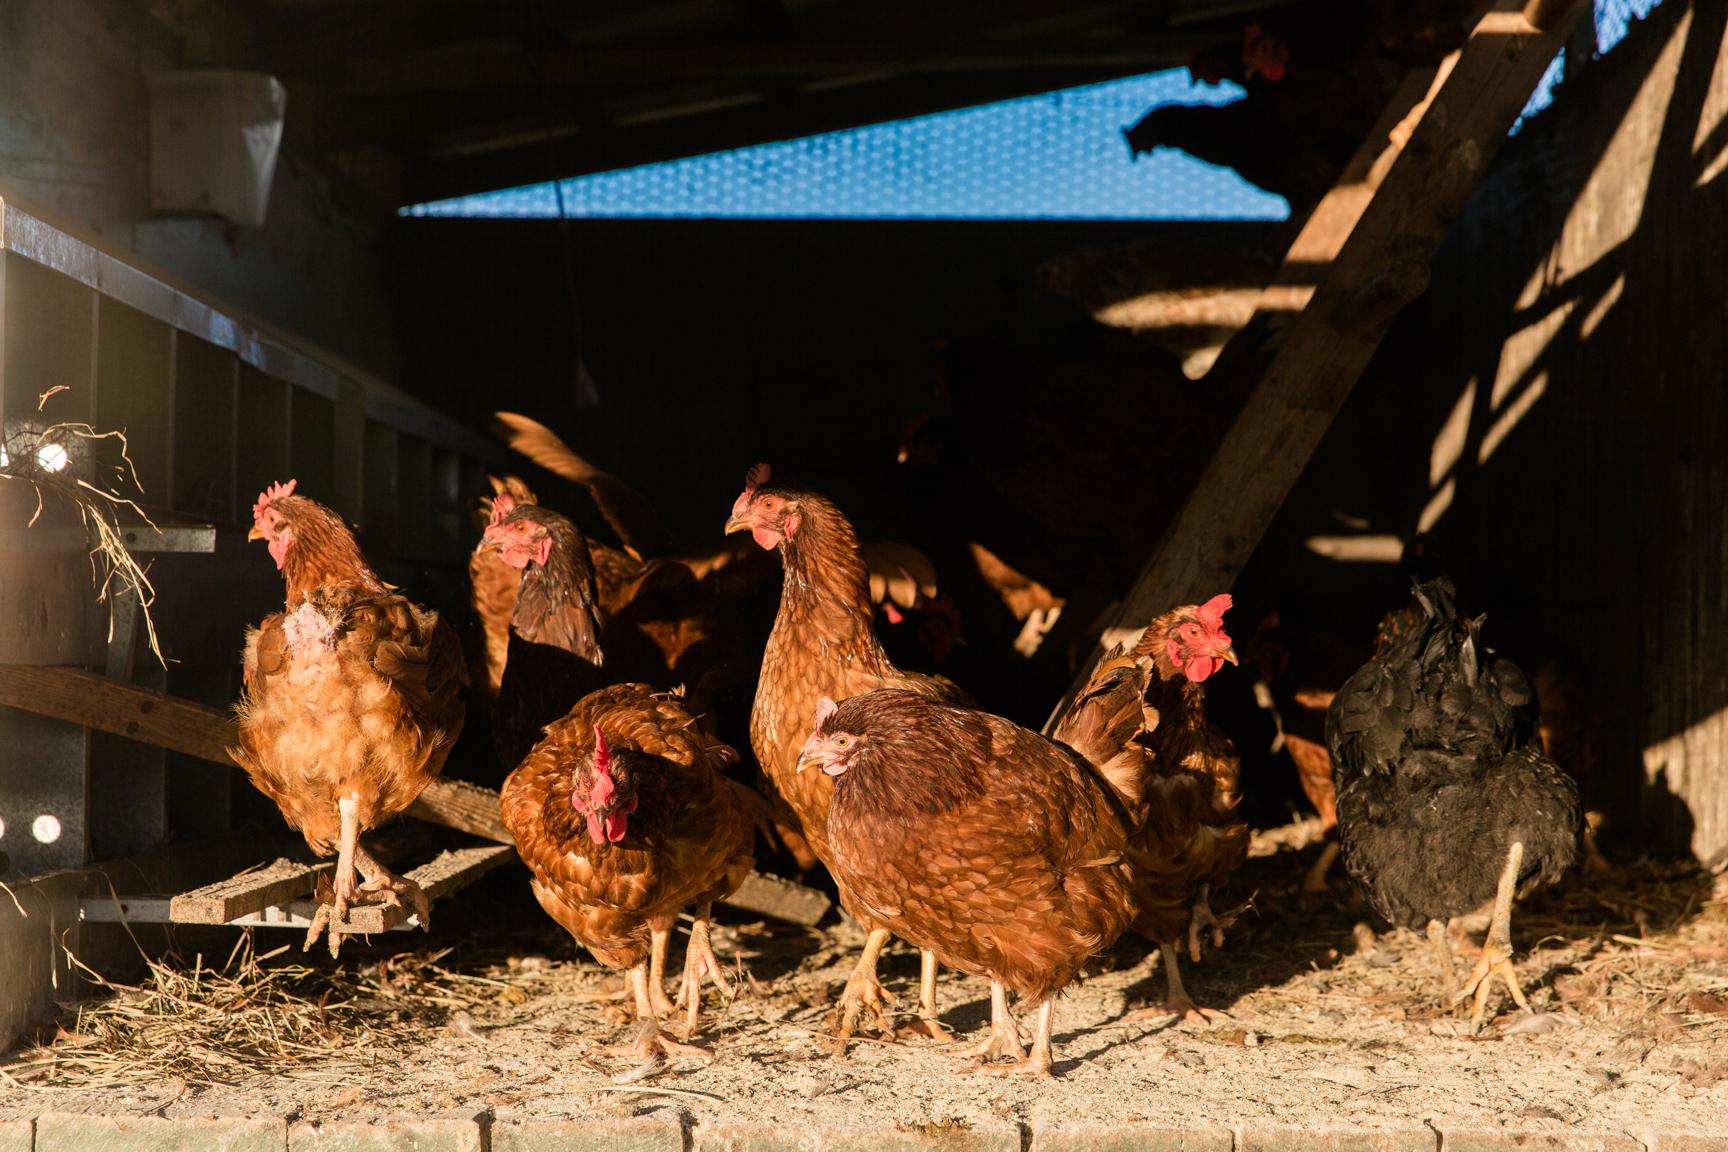 Glynwood Eva Deitch Photography Livestock-4.jpg